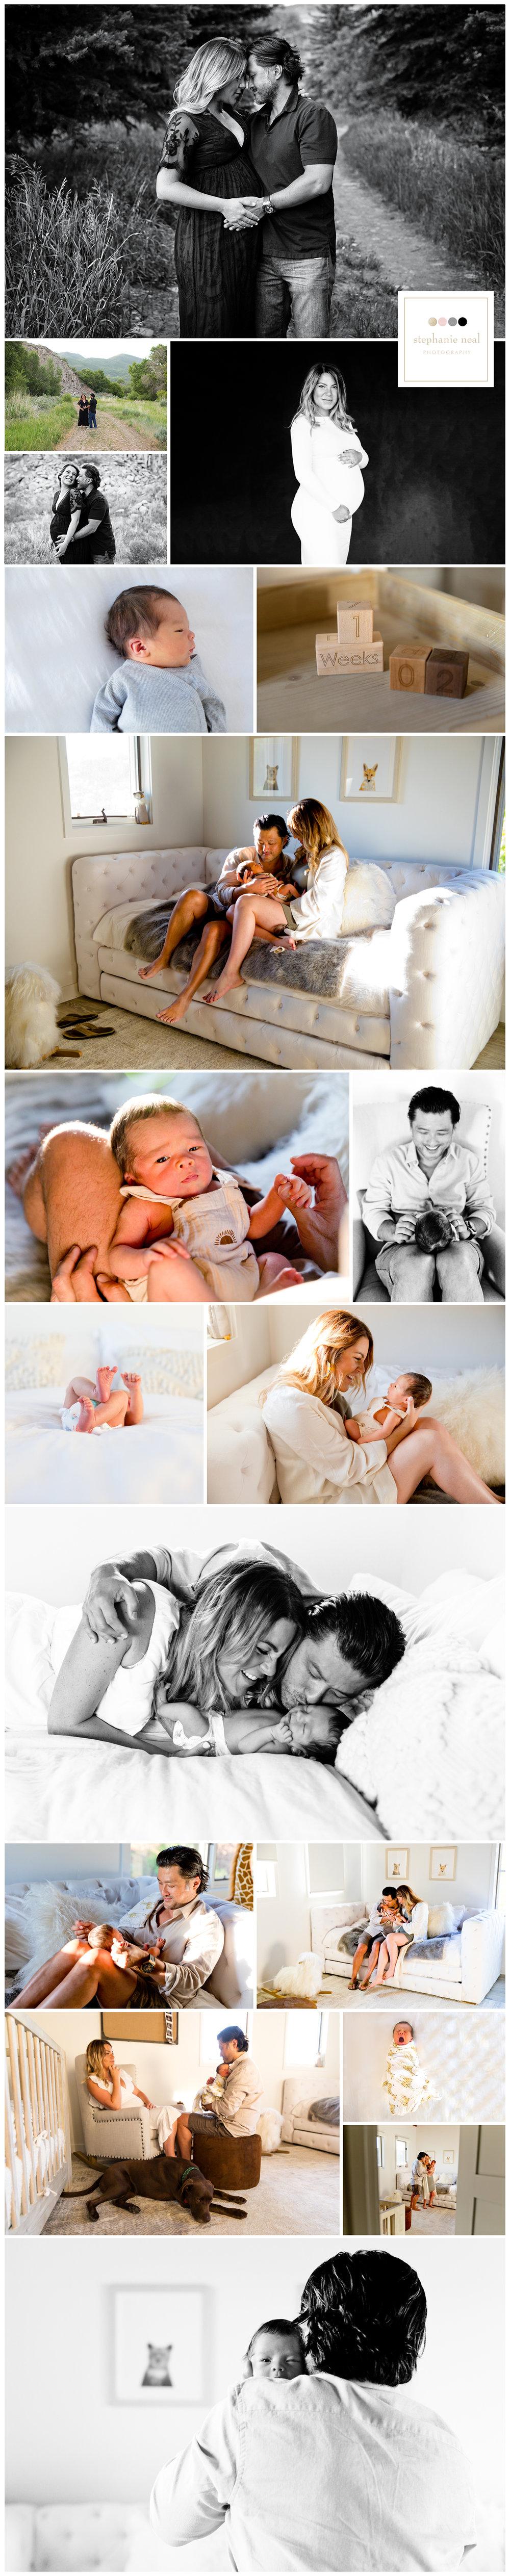 Stephanie Neal Photography, Park City Deer Valley Utah Maternity Newborn Family Photographer.jpg